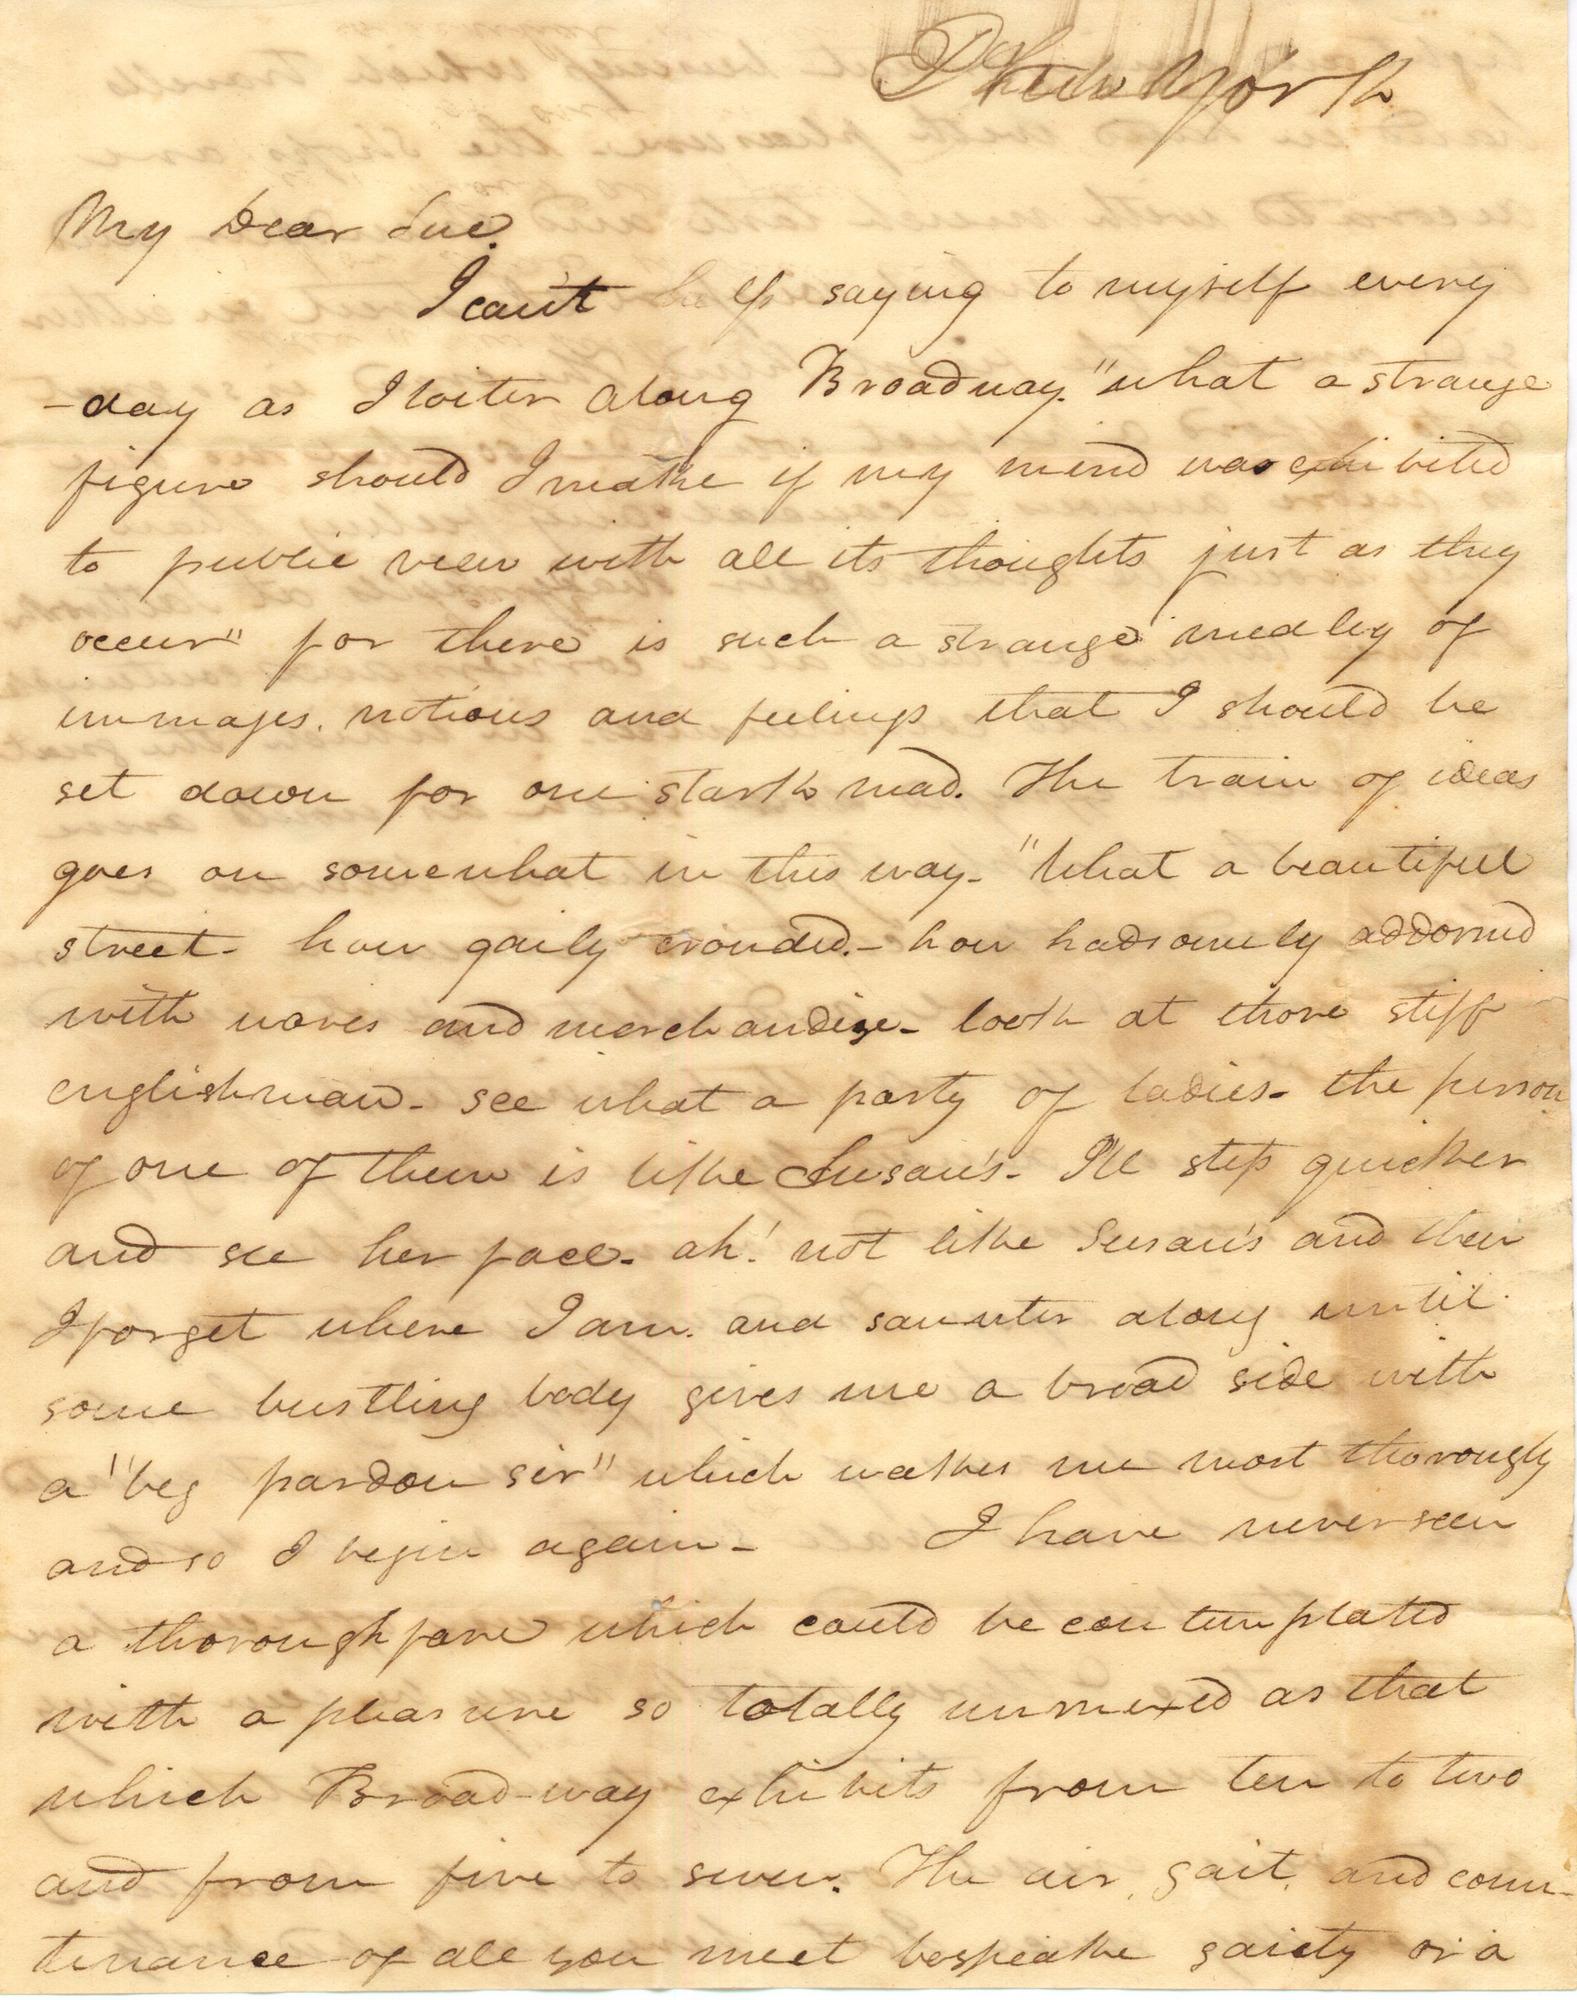 Ms1997_002_SmithfieldPreston_Letter_1819_0423a.jpg